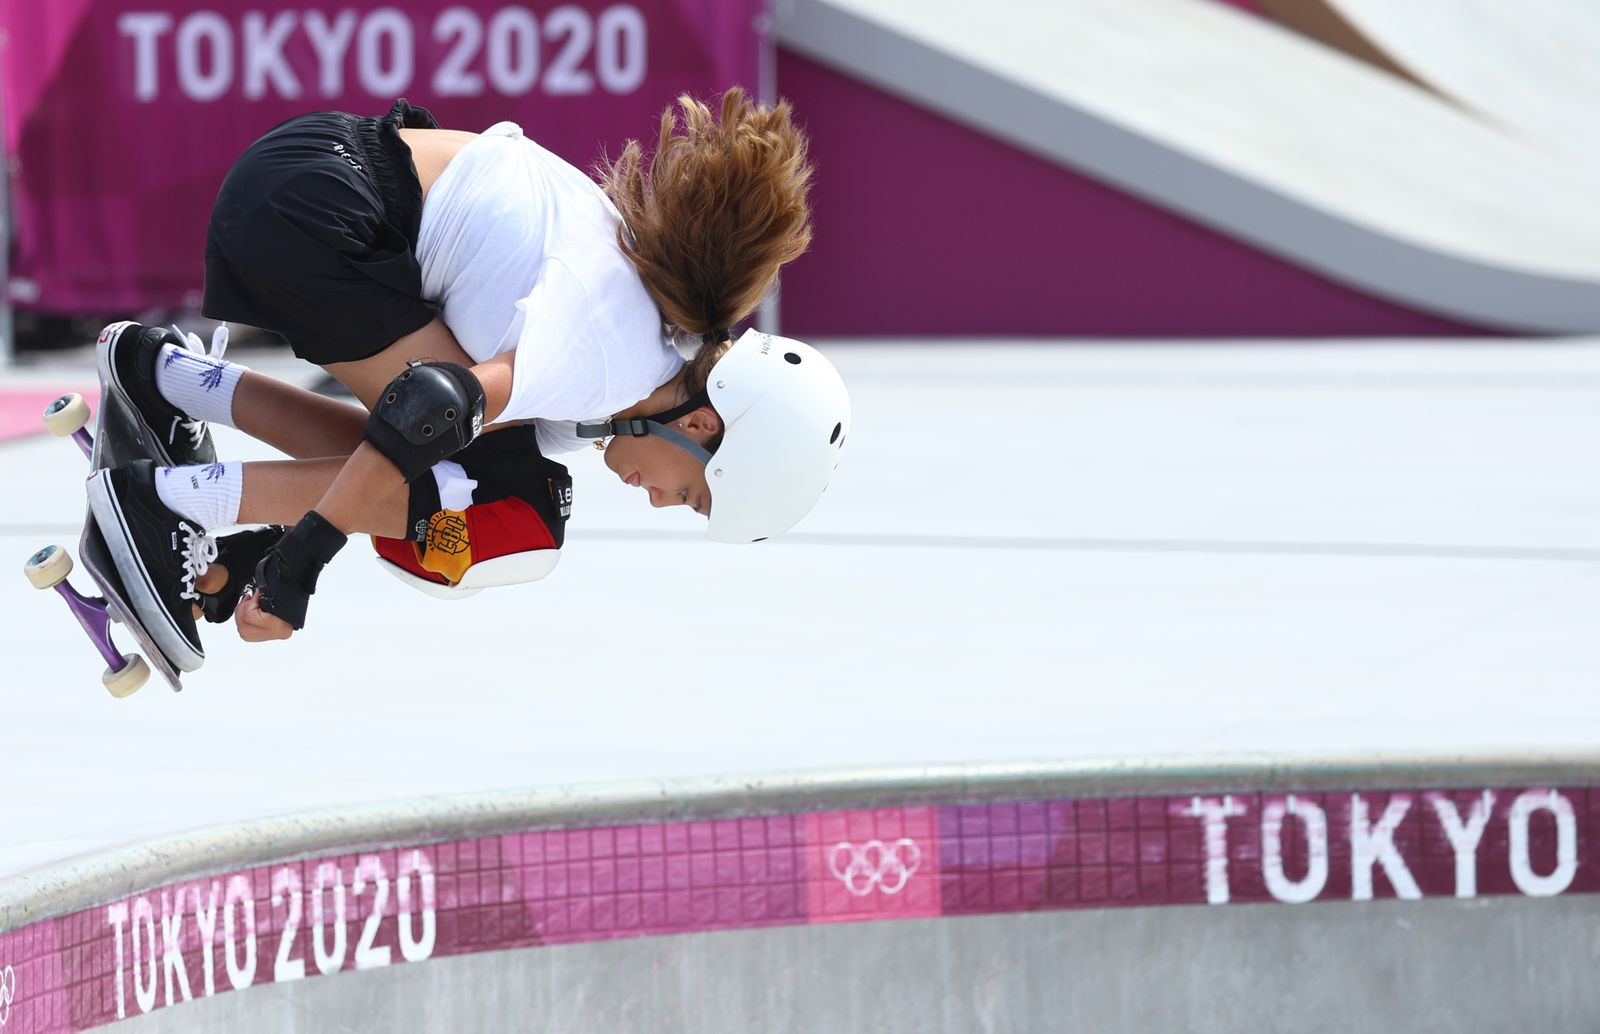 Skateboarding - Women's Park - Preliminary Round